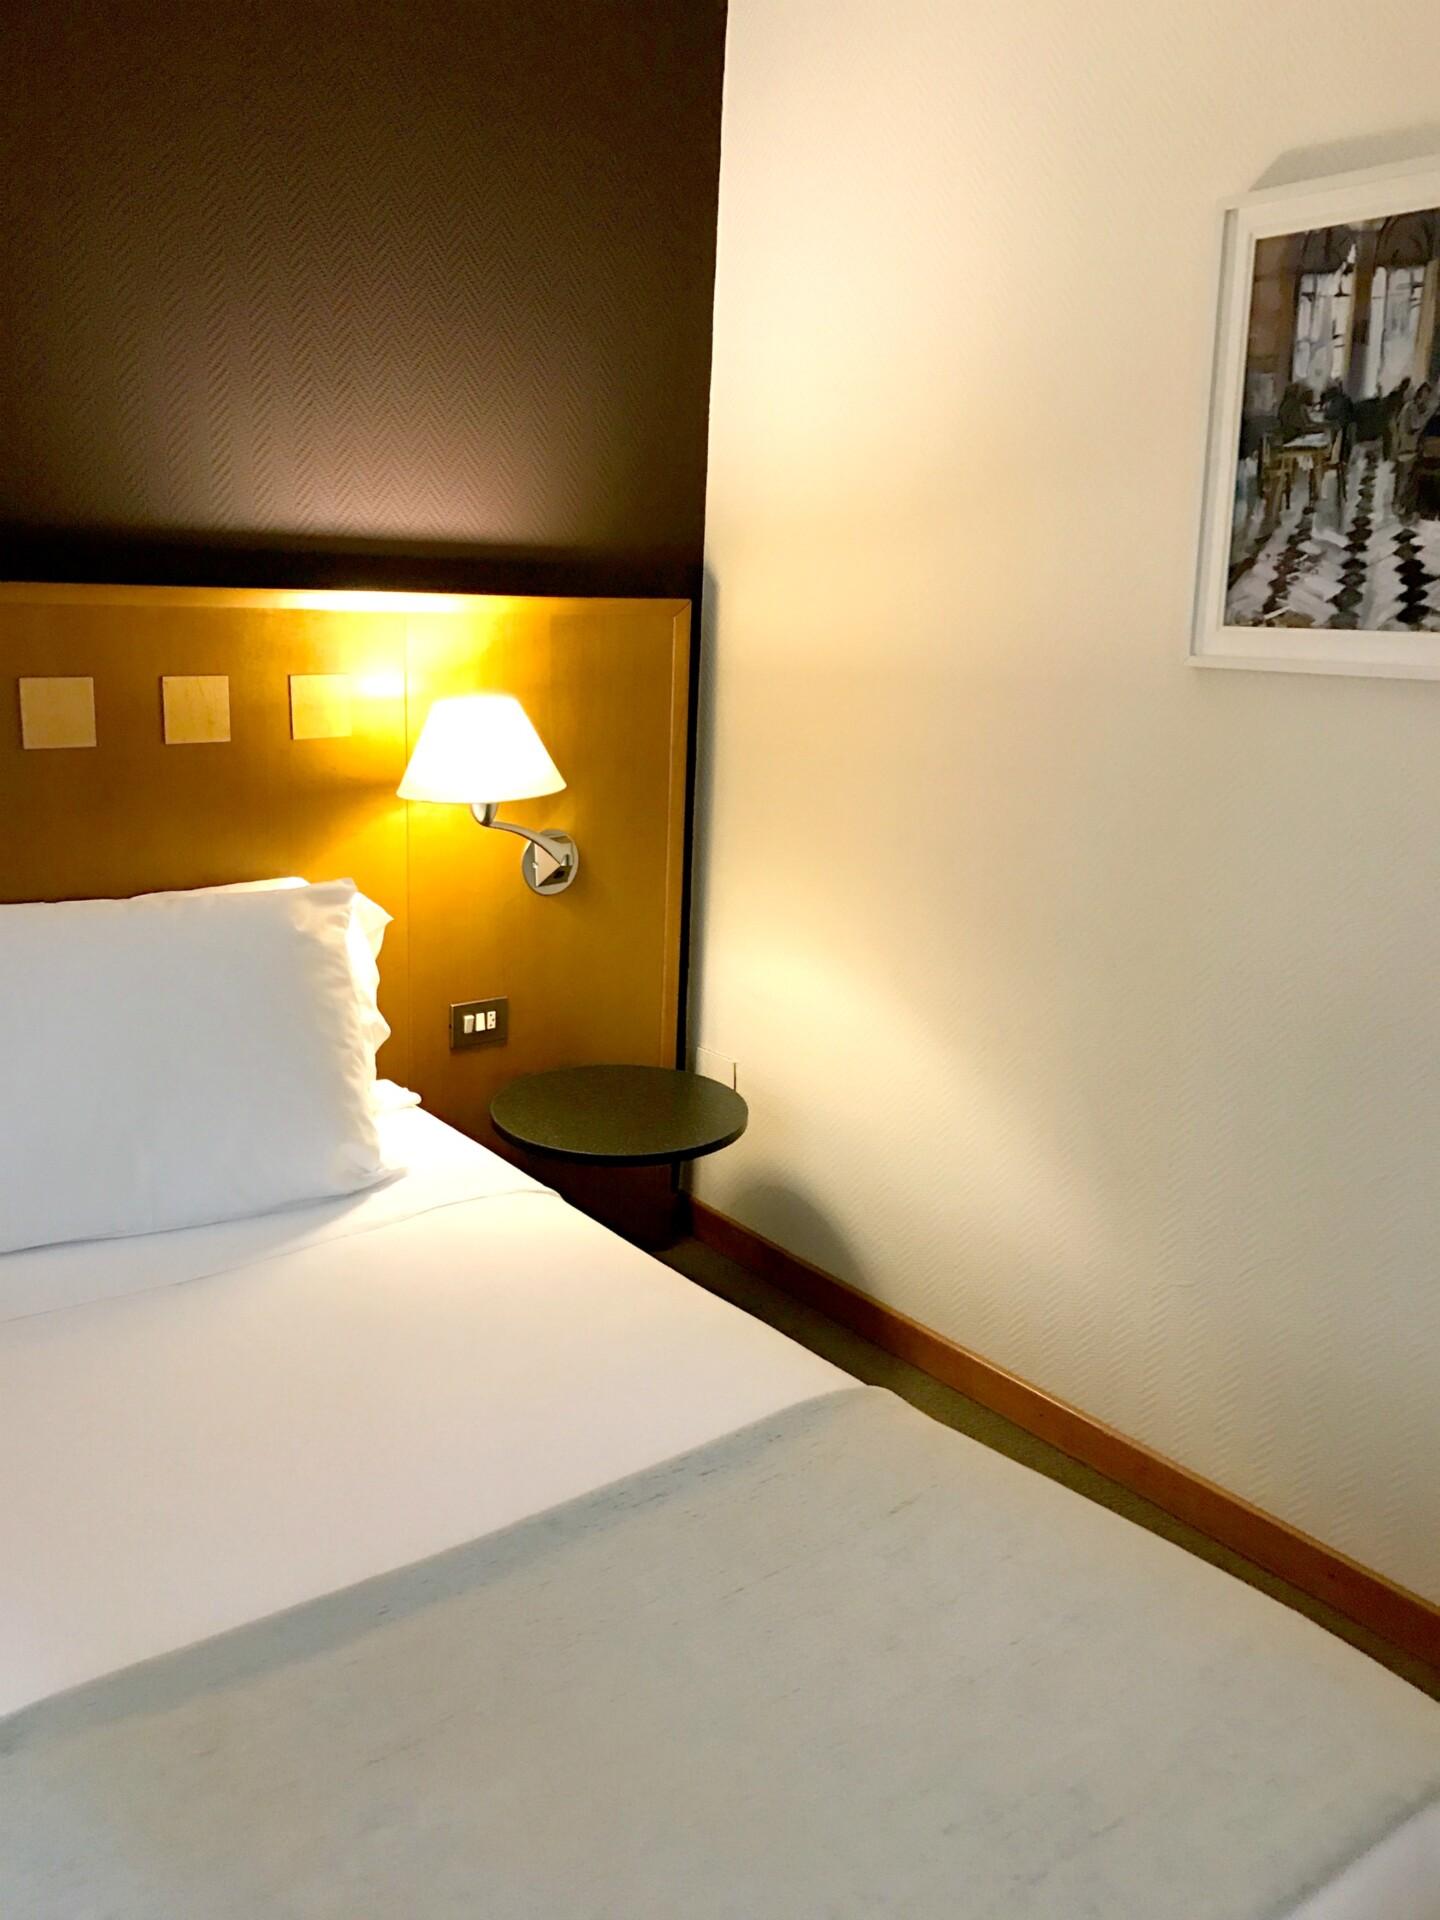 yhotellet Hotel Carlemany i Girona